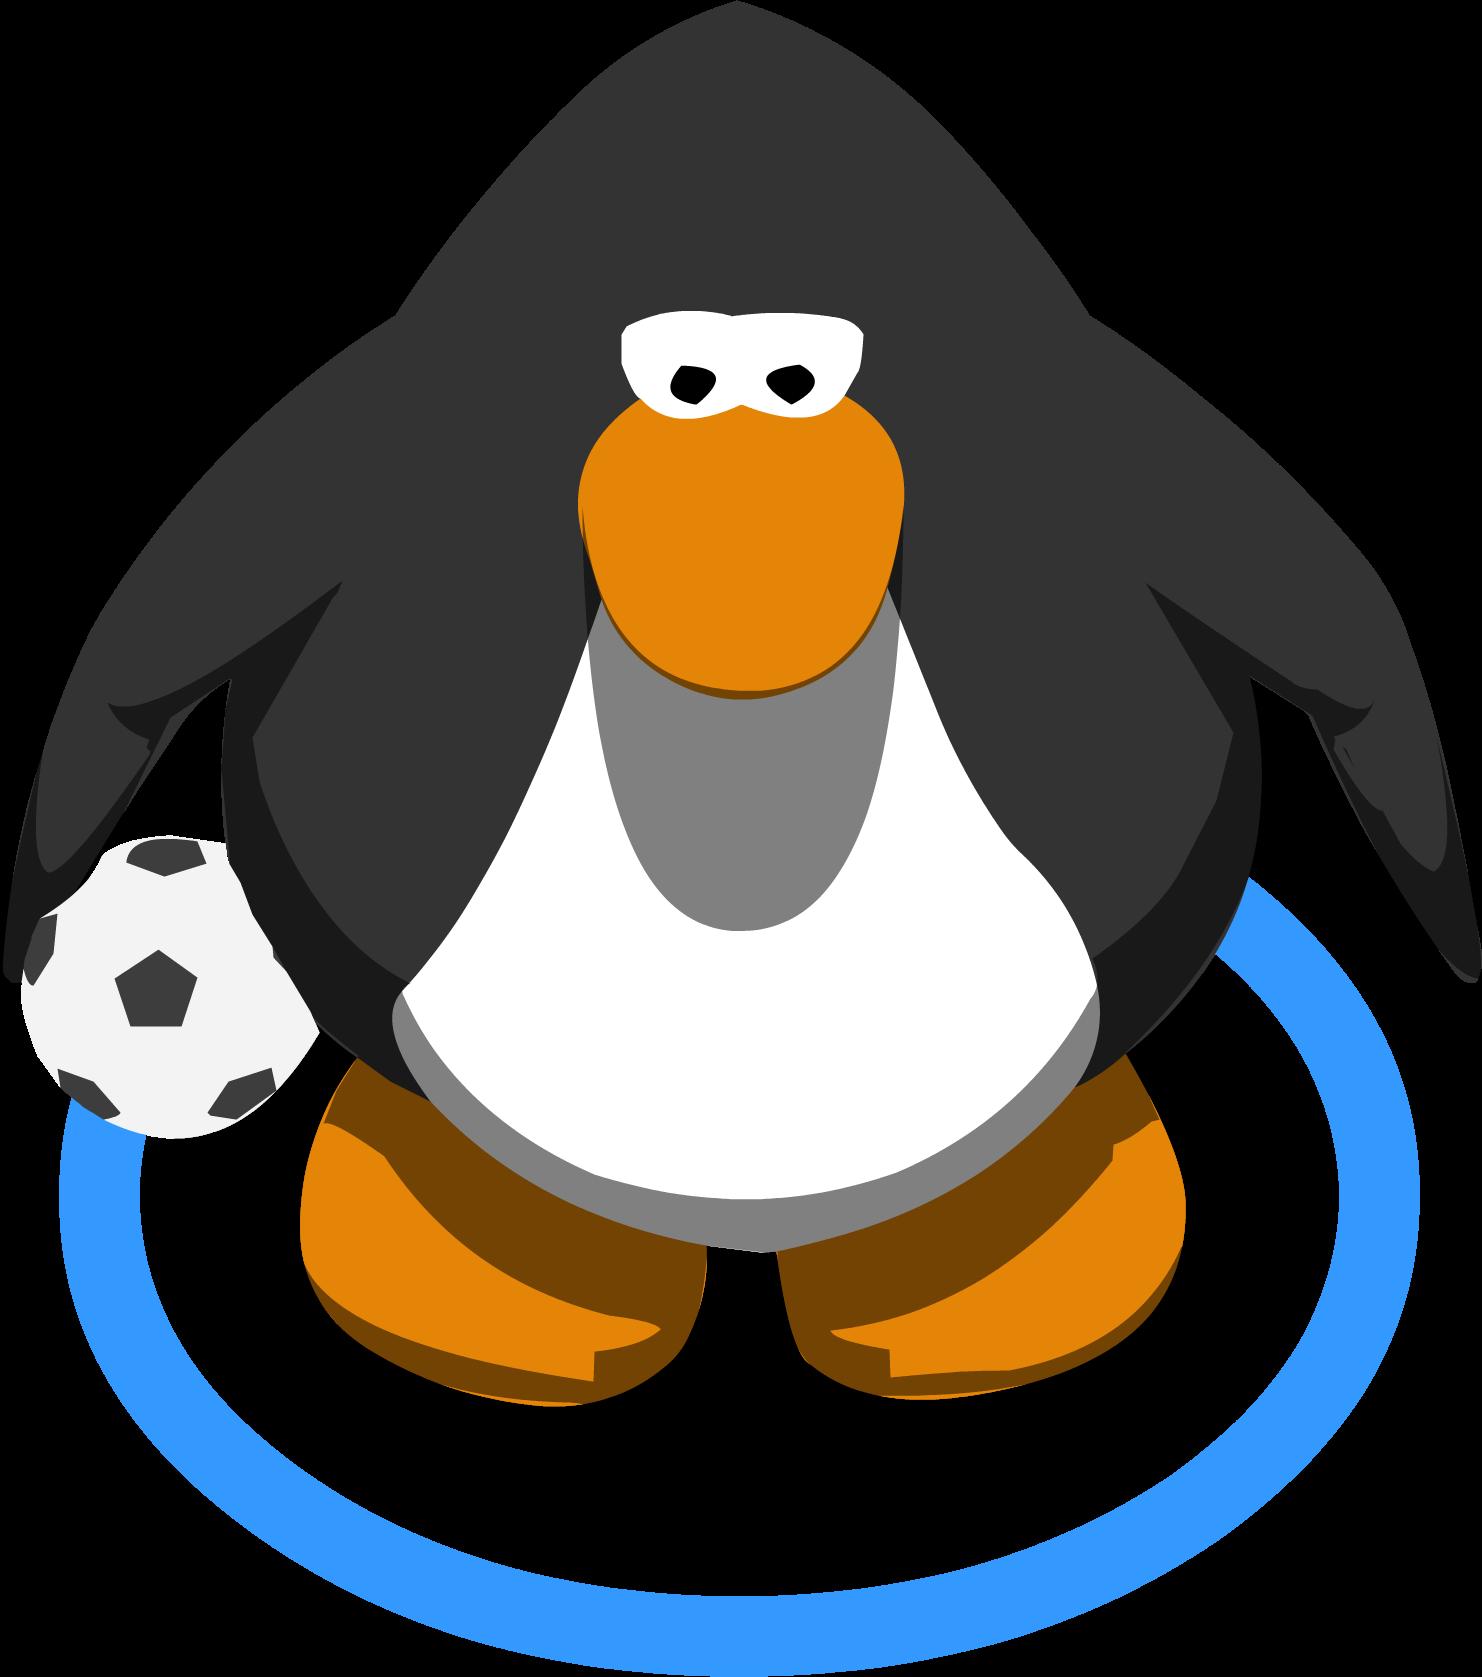 Clipart penguin soccer. Image ball in game